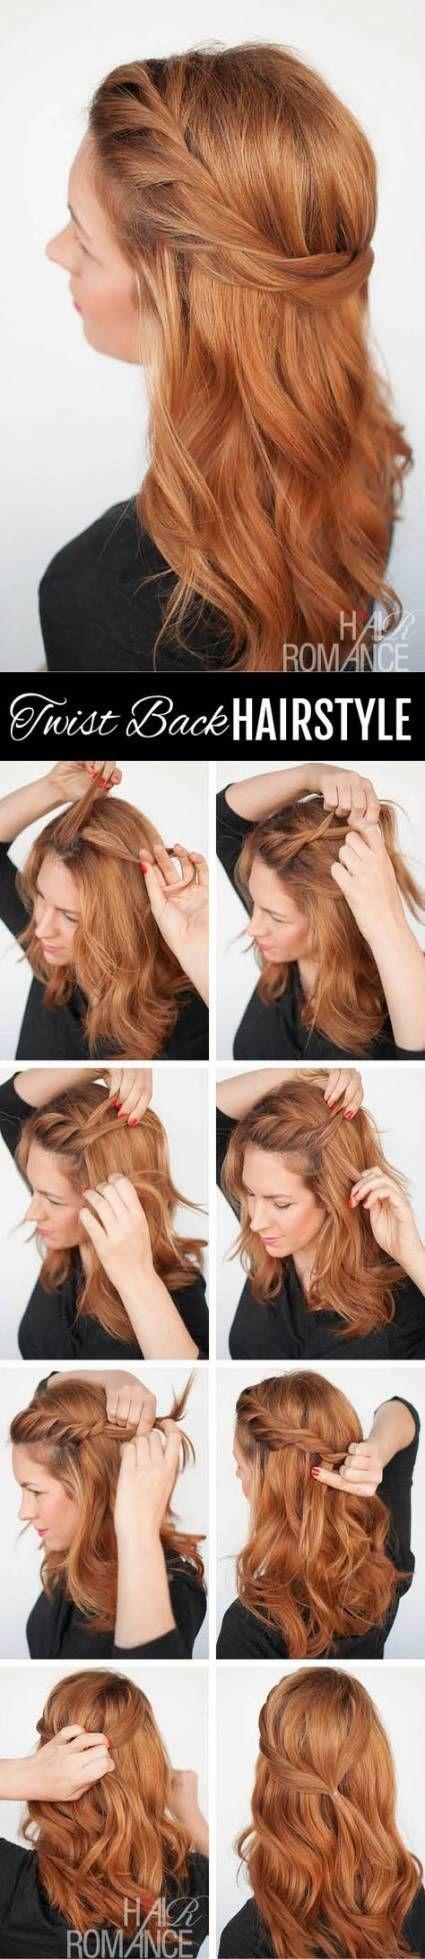 Hair Bun Front Easy Frisuren 39+ Ideen Mehr unter kpsl.youareblabla ...